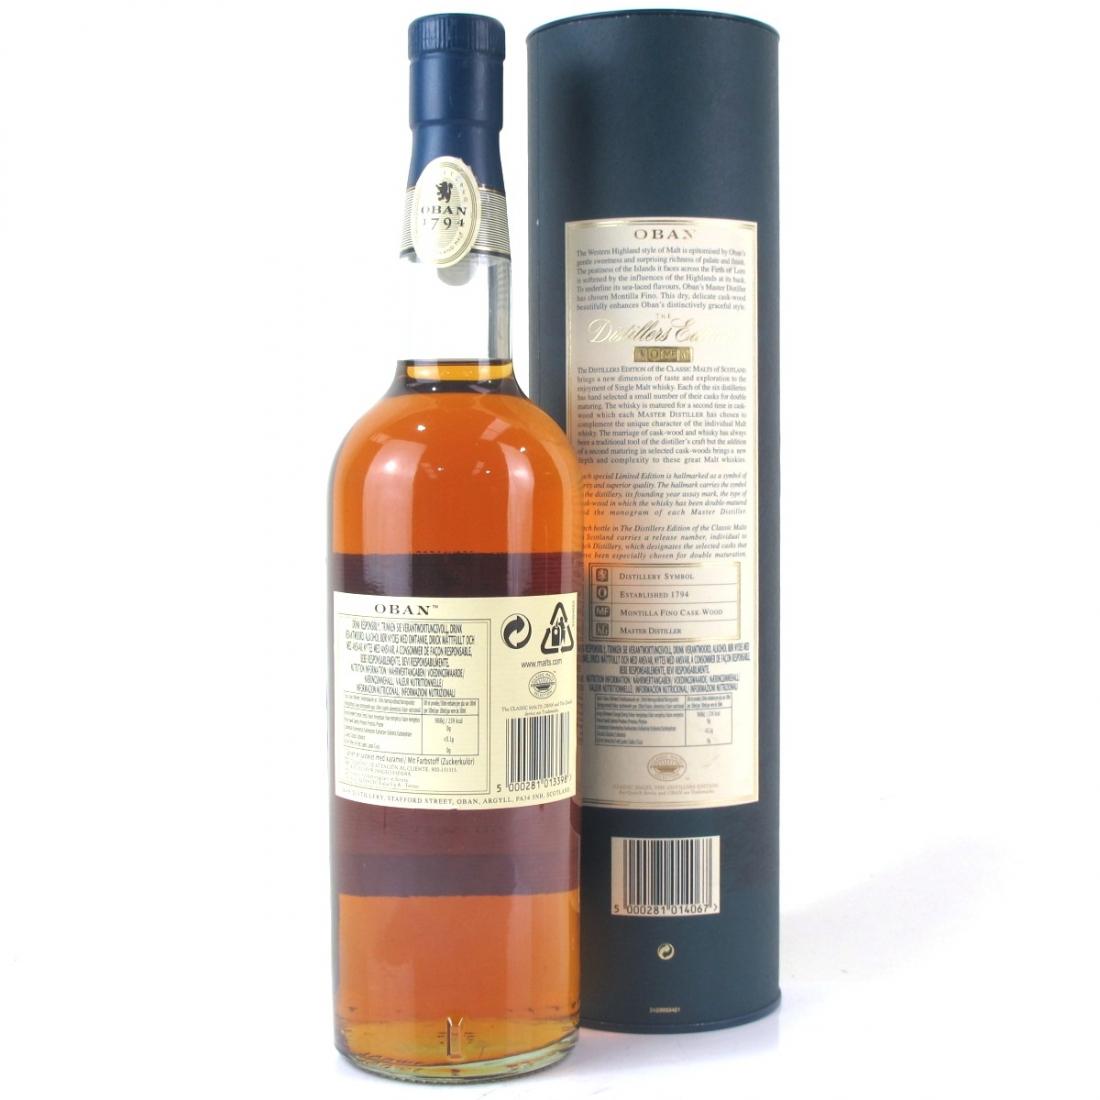 Oban 1995 Distillers Edition